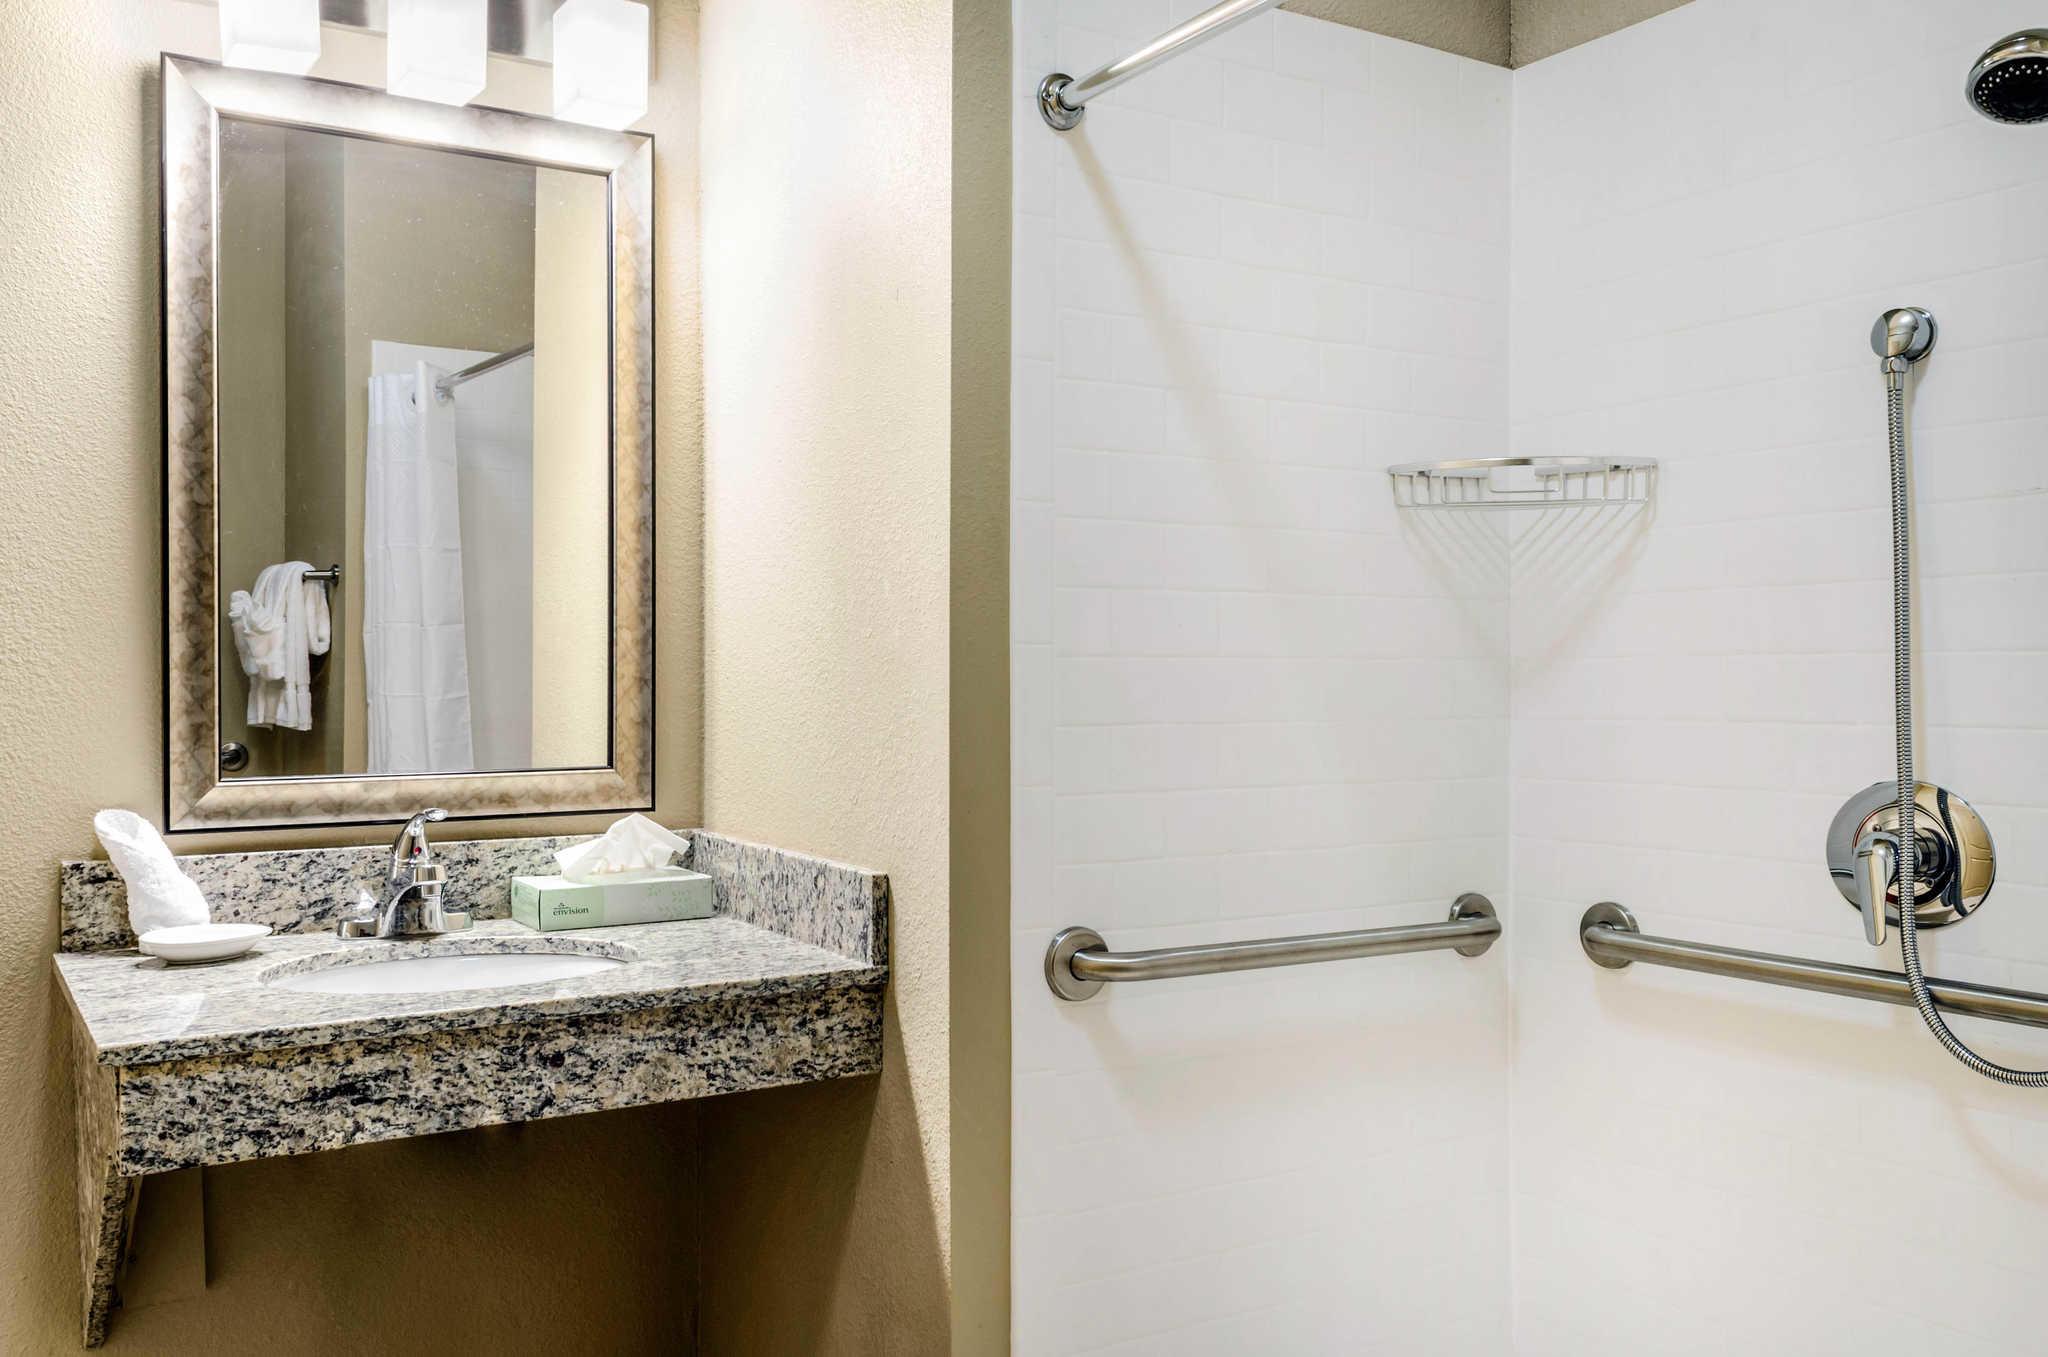 MainStay Suites Hackberry Sportsman's Lodge image 23